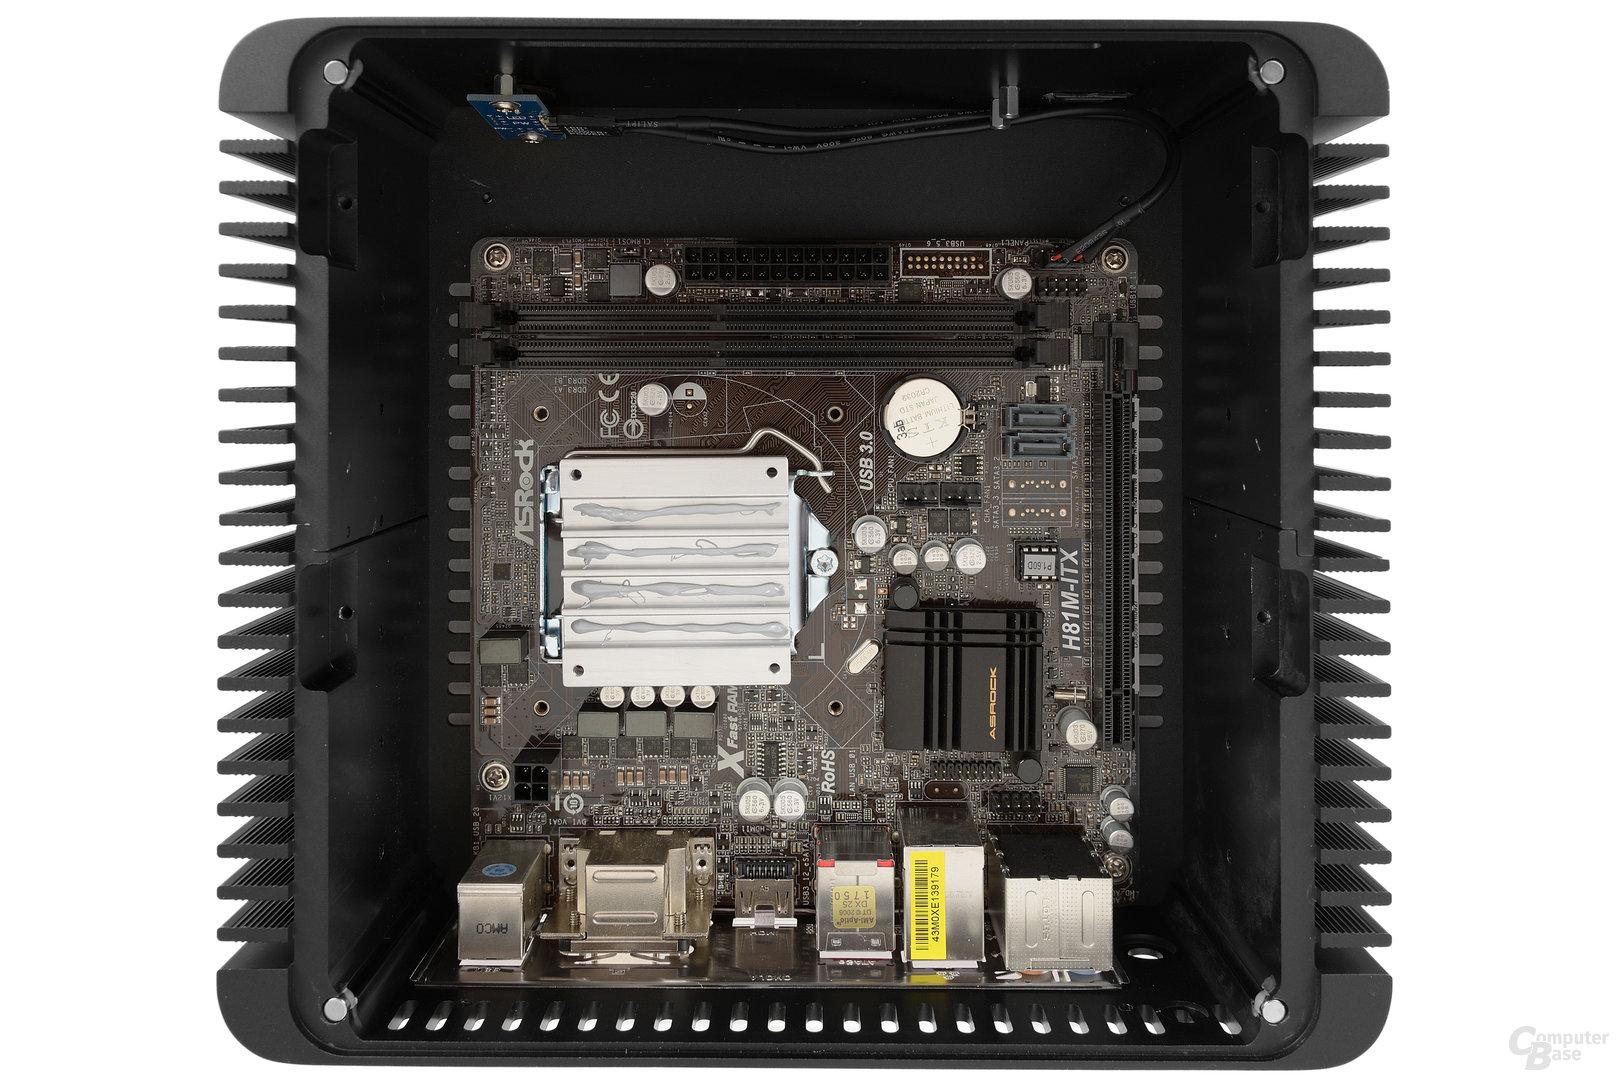 Nanum SE-TC5 – Teil des CPU-Kühlers mit Wärmeleitpaste